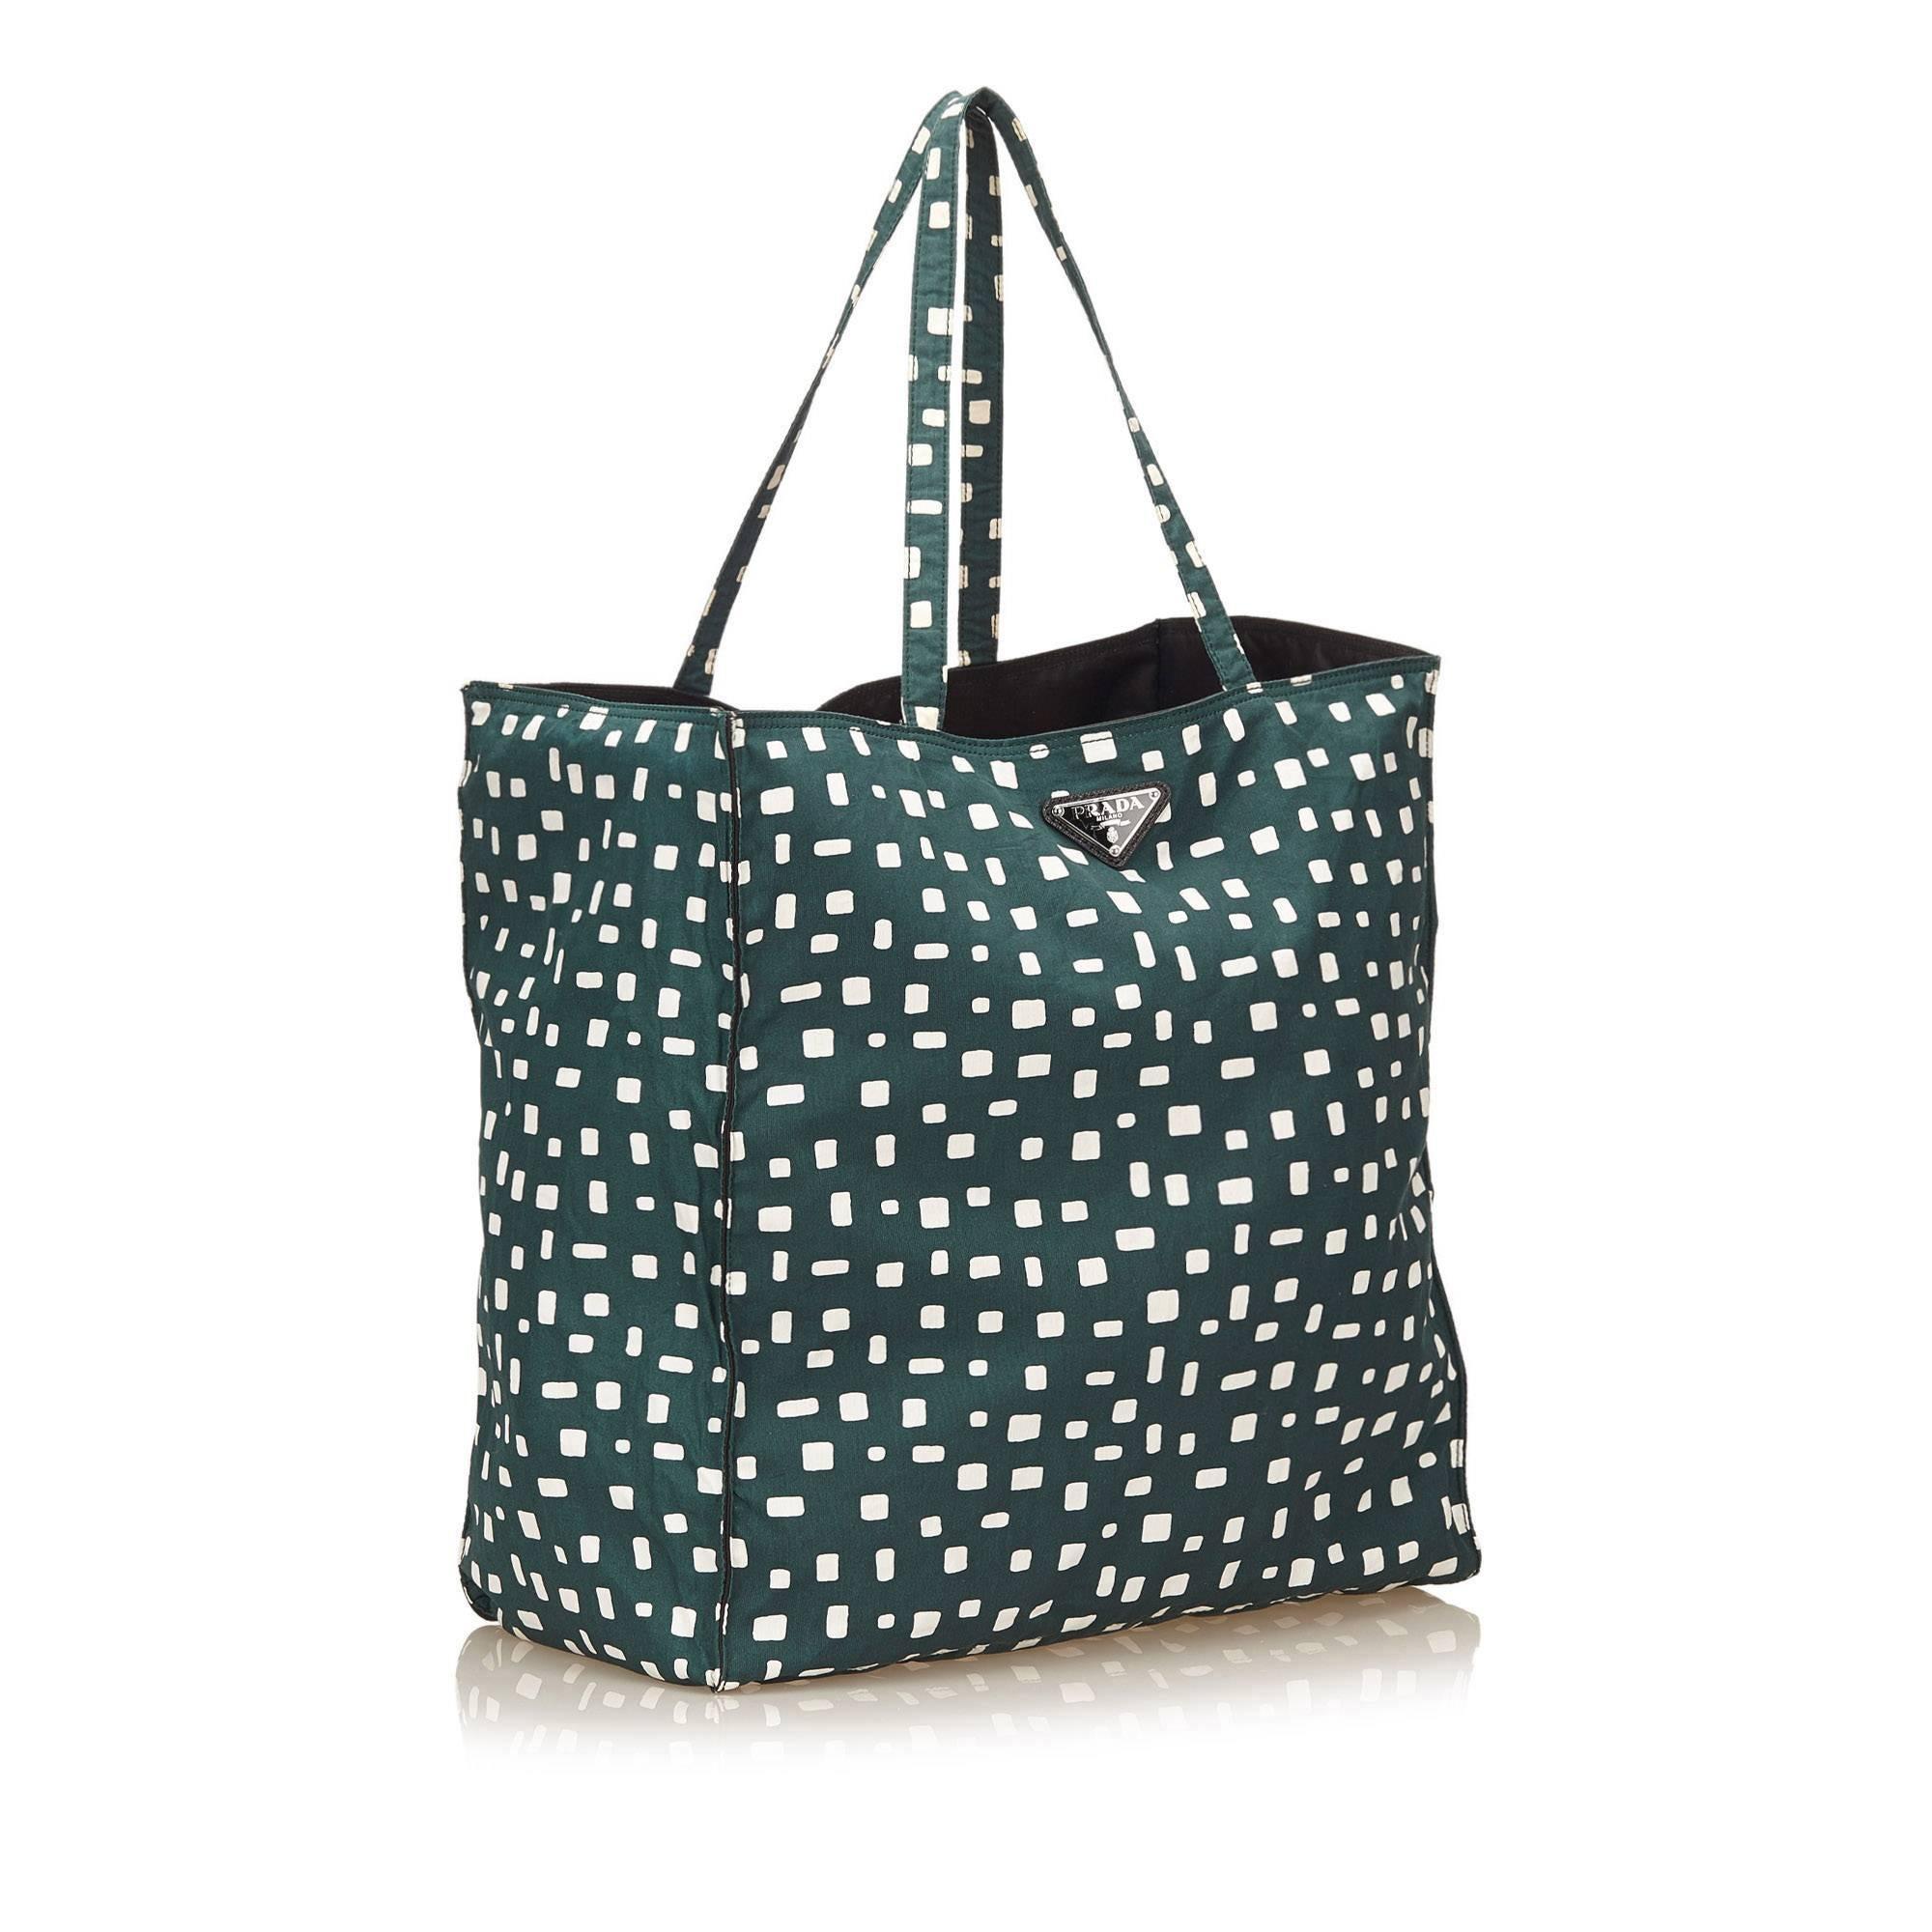 49ce9d59c0 Prada Dark Green and White Pattern Nylon Tote Bag For Sale at 1stdibs